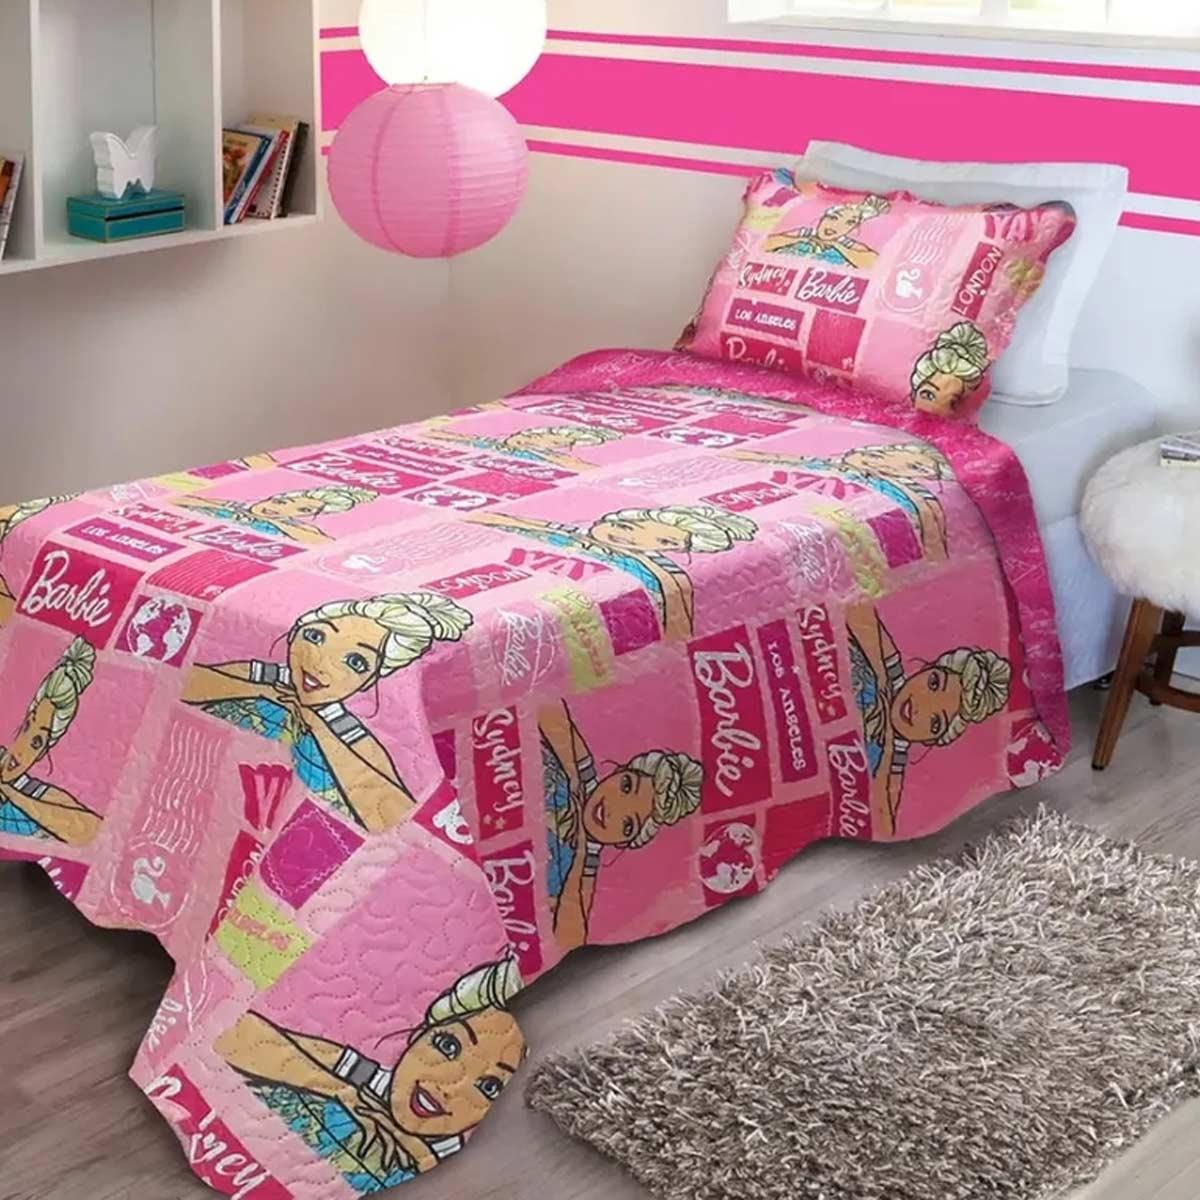 Colcha Infantil Barbie Menina Rosa Solteiro Ultrasonic Jolitex